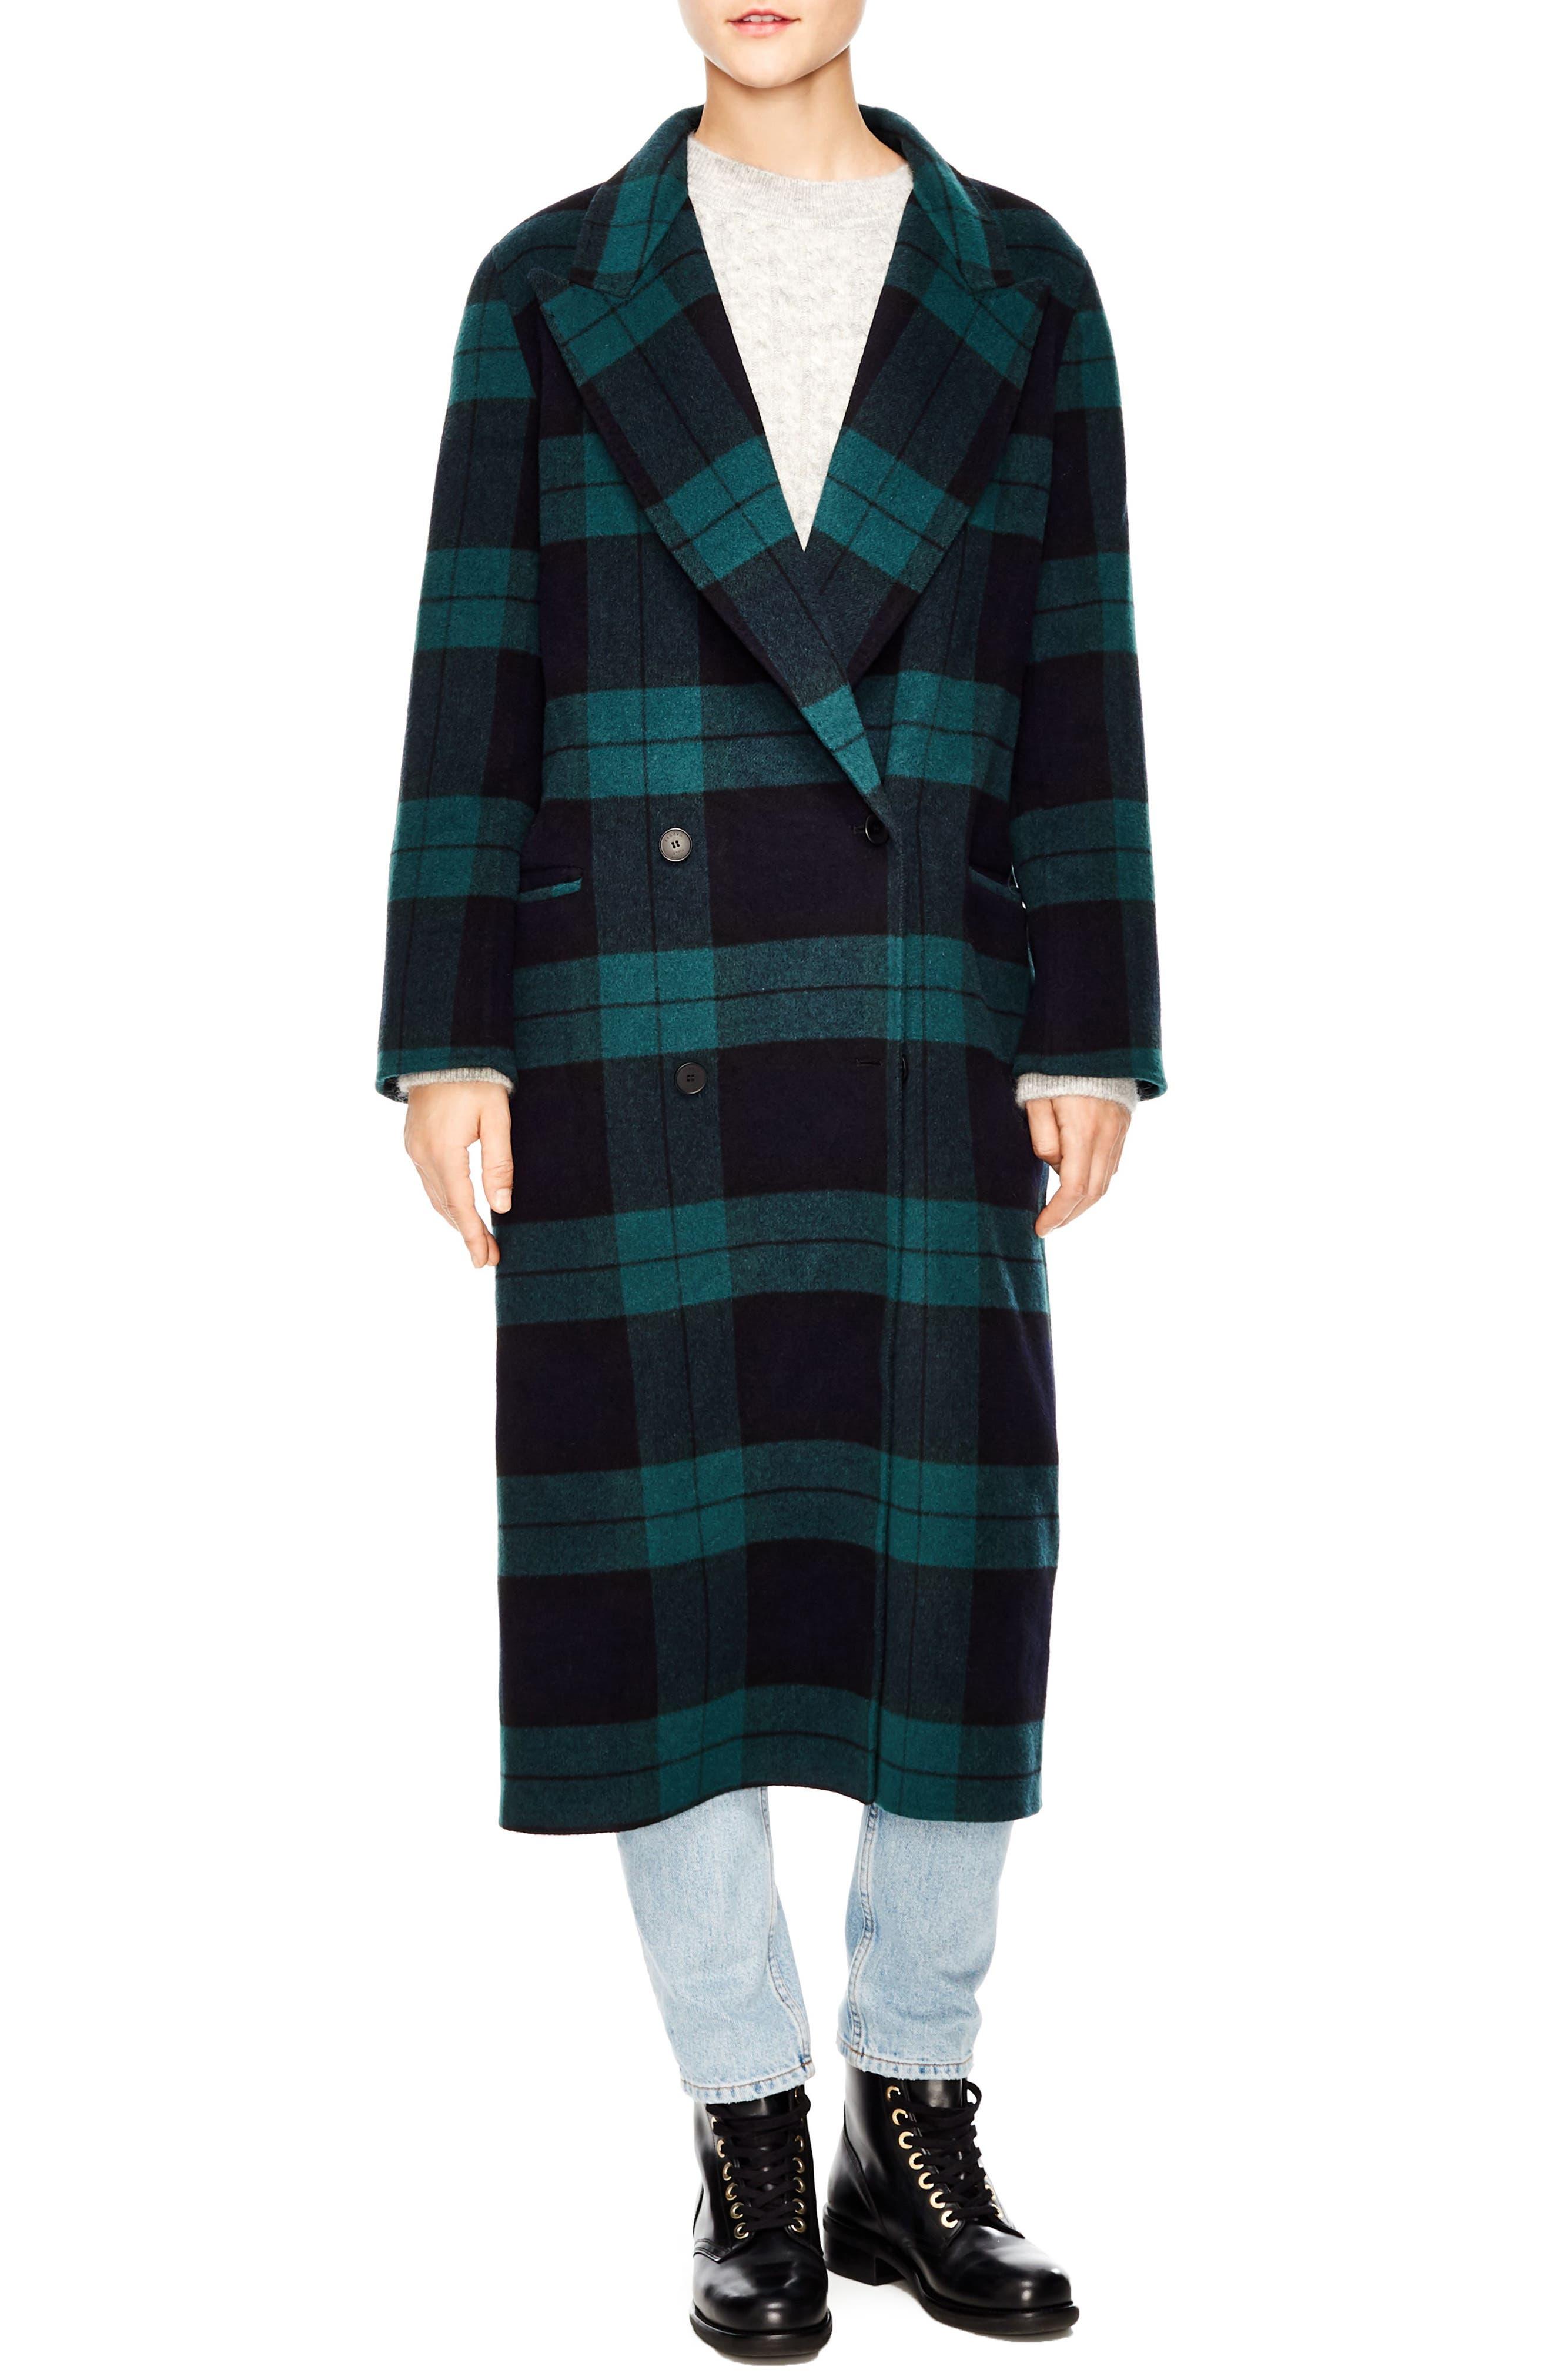 Pense Plaid Wool Blend Coat,                         Main,                         color, GREEN